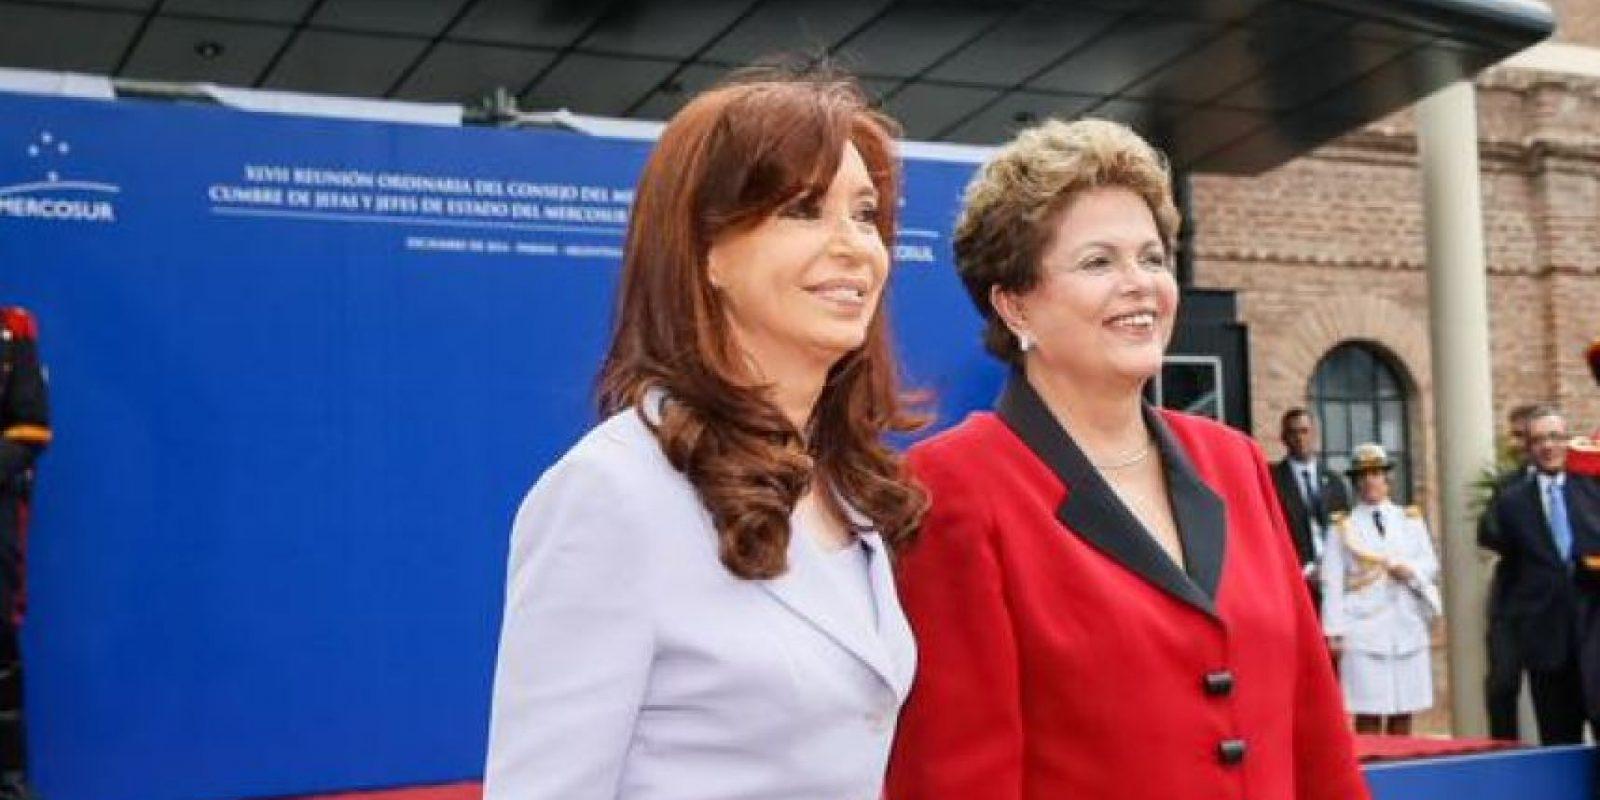 Foto:Twitter @DilmaBR